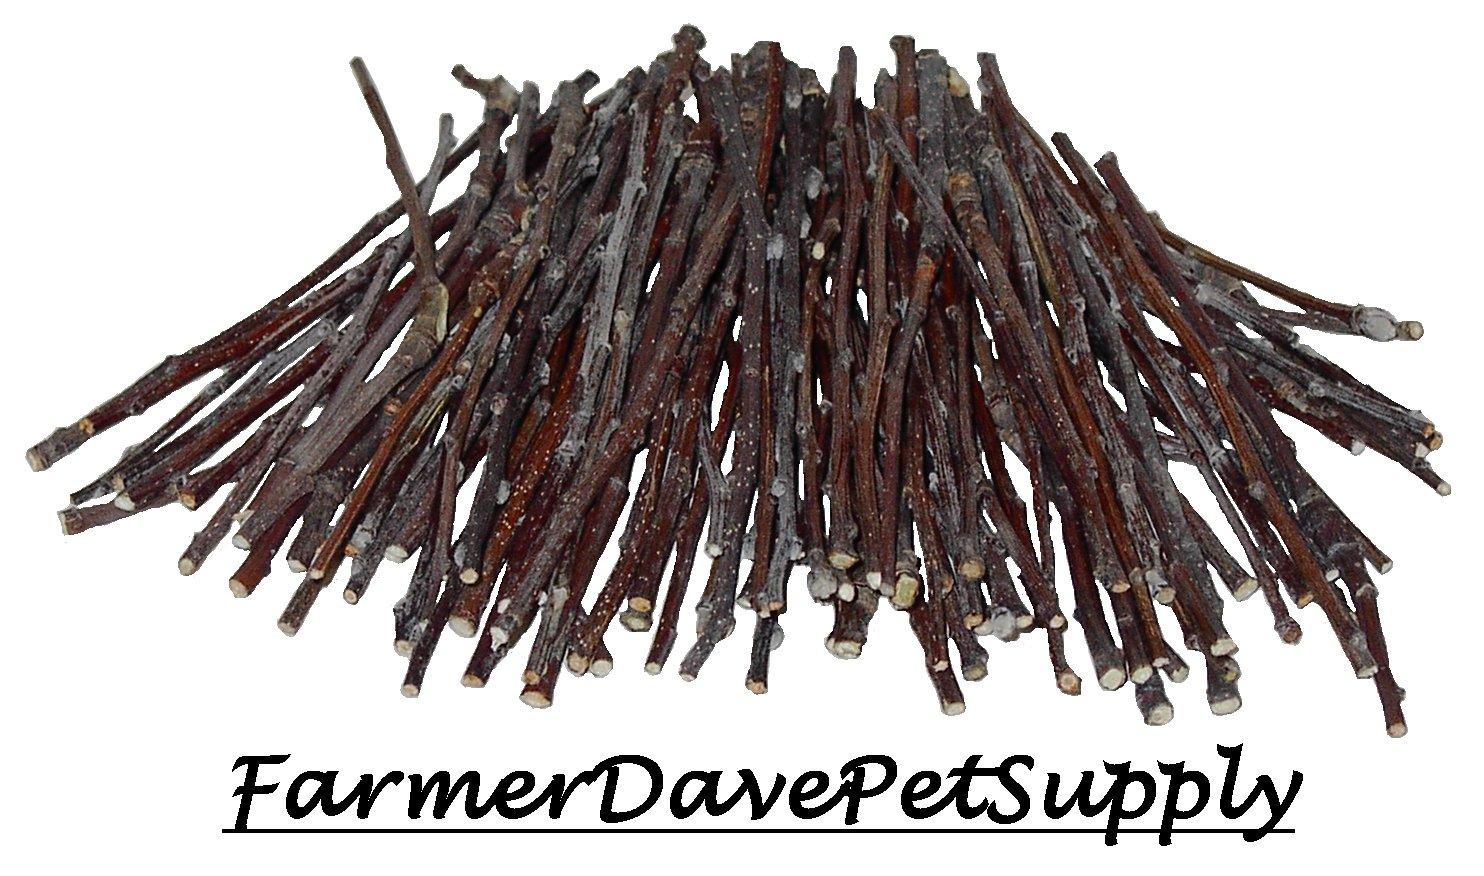 FarmerDavePetSupply 100 Apple Ultra Skinny Chew Twigs for Small Animals by FarmerDavePetSupply